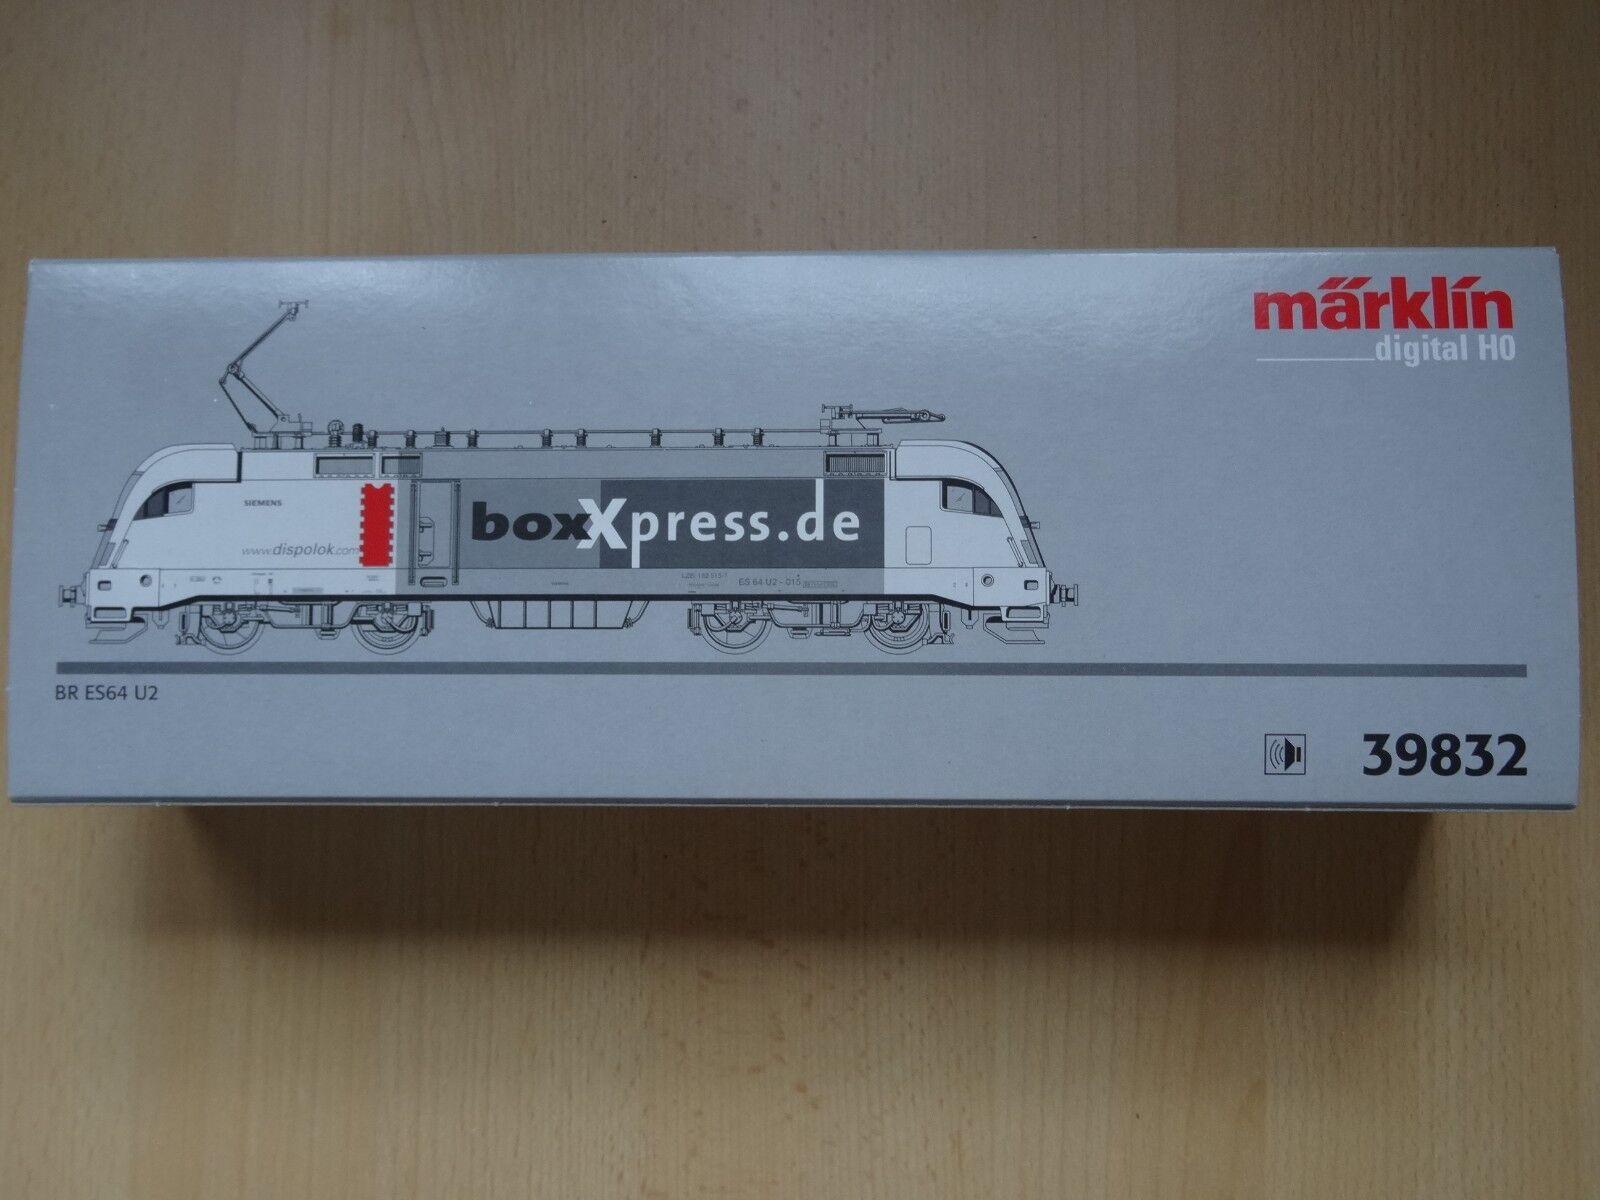 Märklin HO 39832 E-Lok BR es 64 U 2 boxxpress Dig, sound Neuw/Org-KT